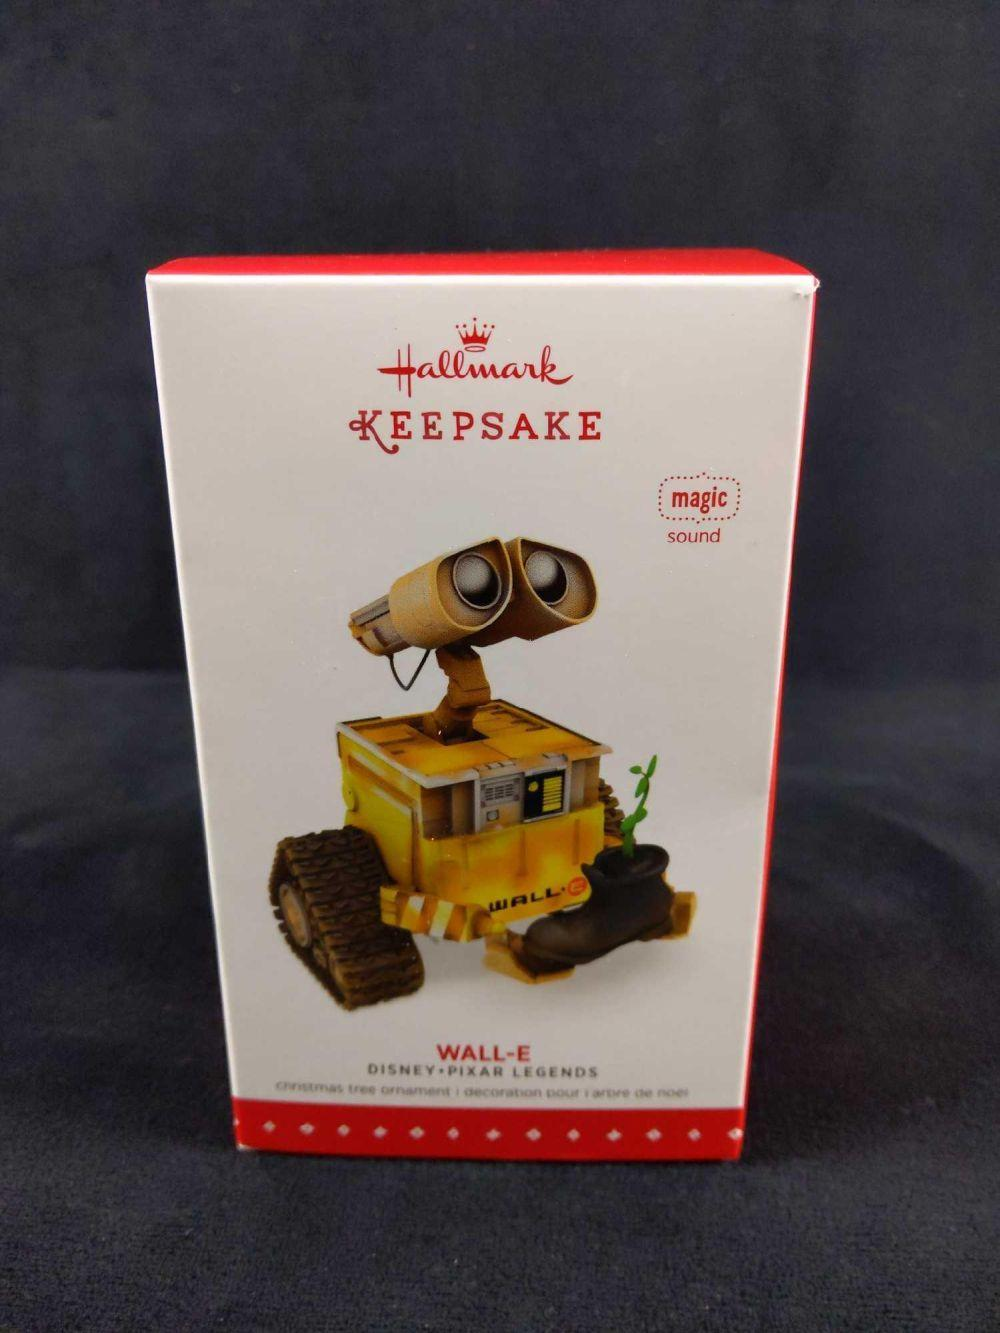 Lot 285: Hallmark Keepsake Wall E Christmas Ornament